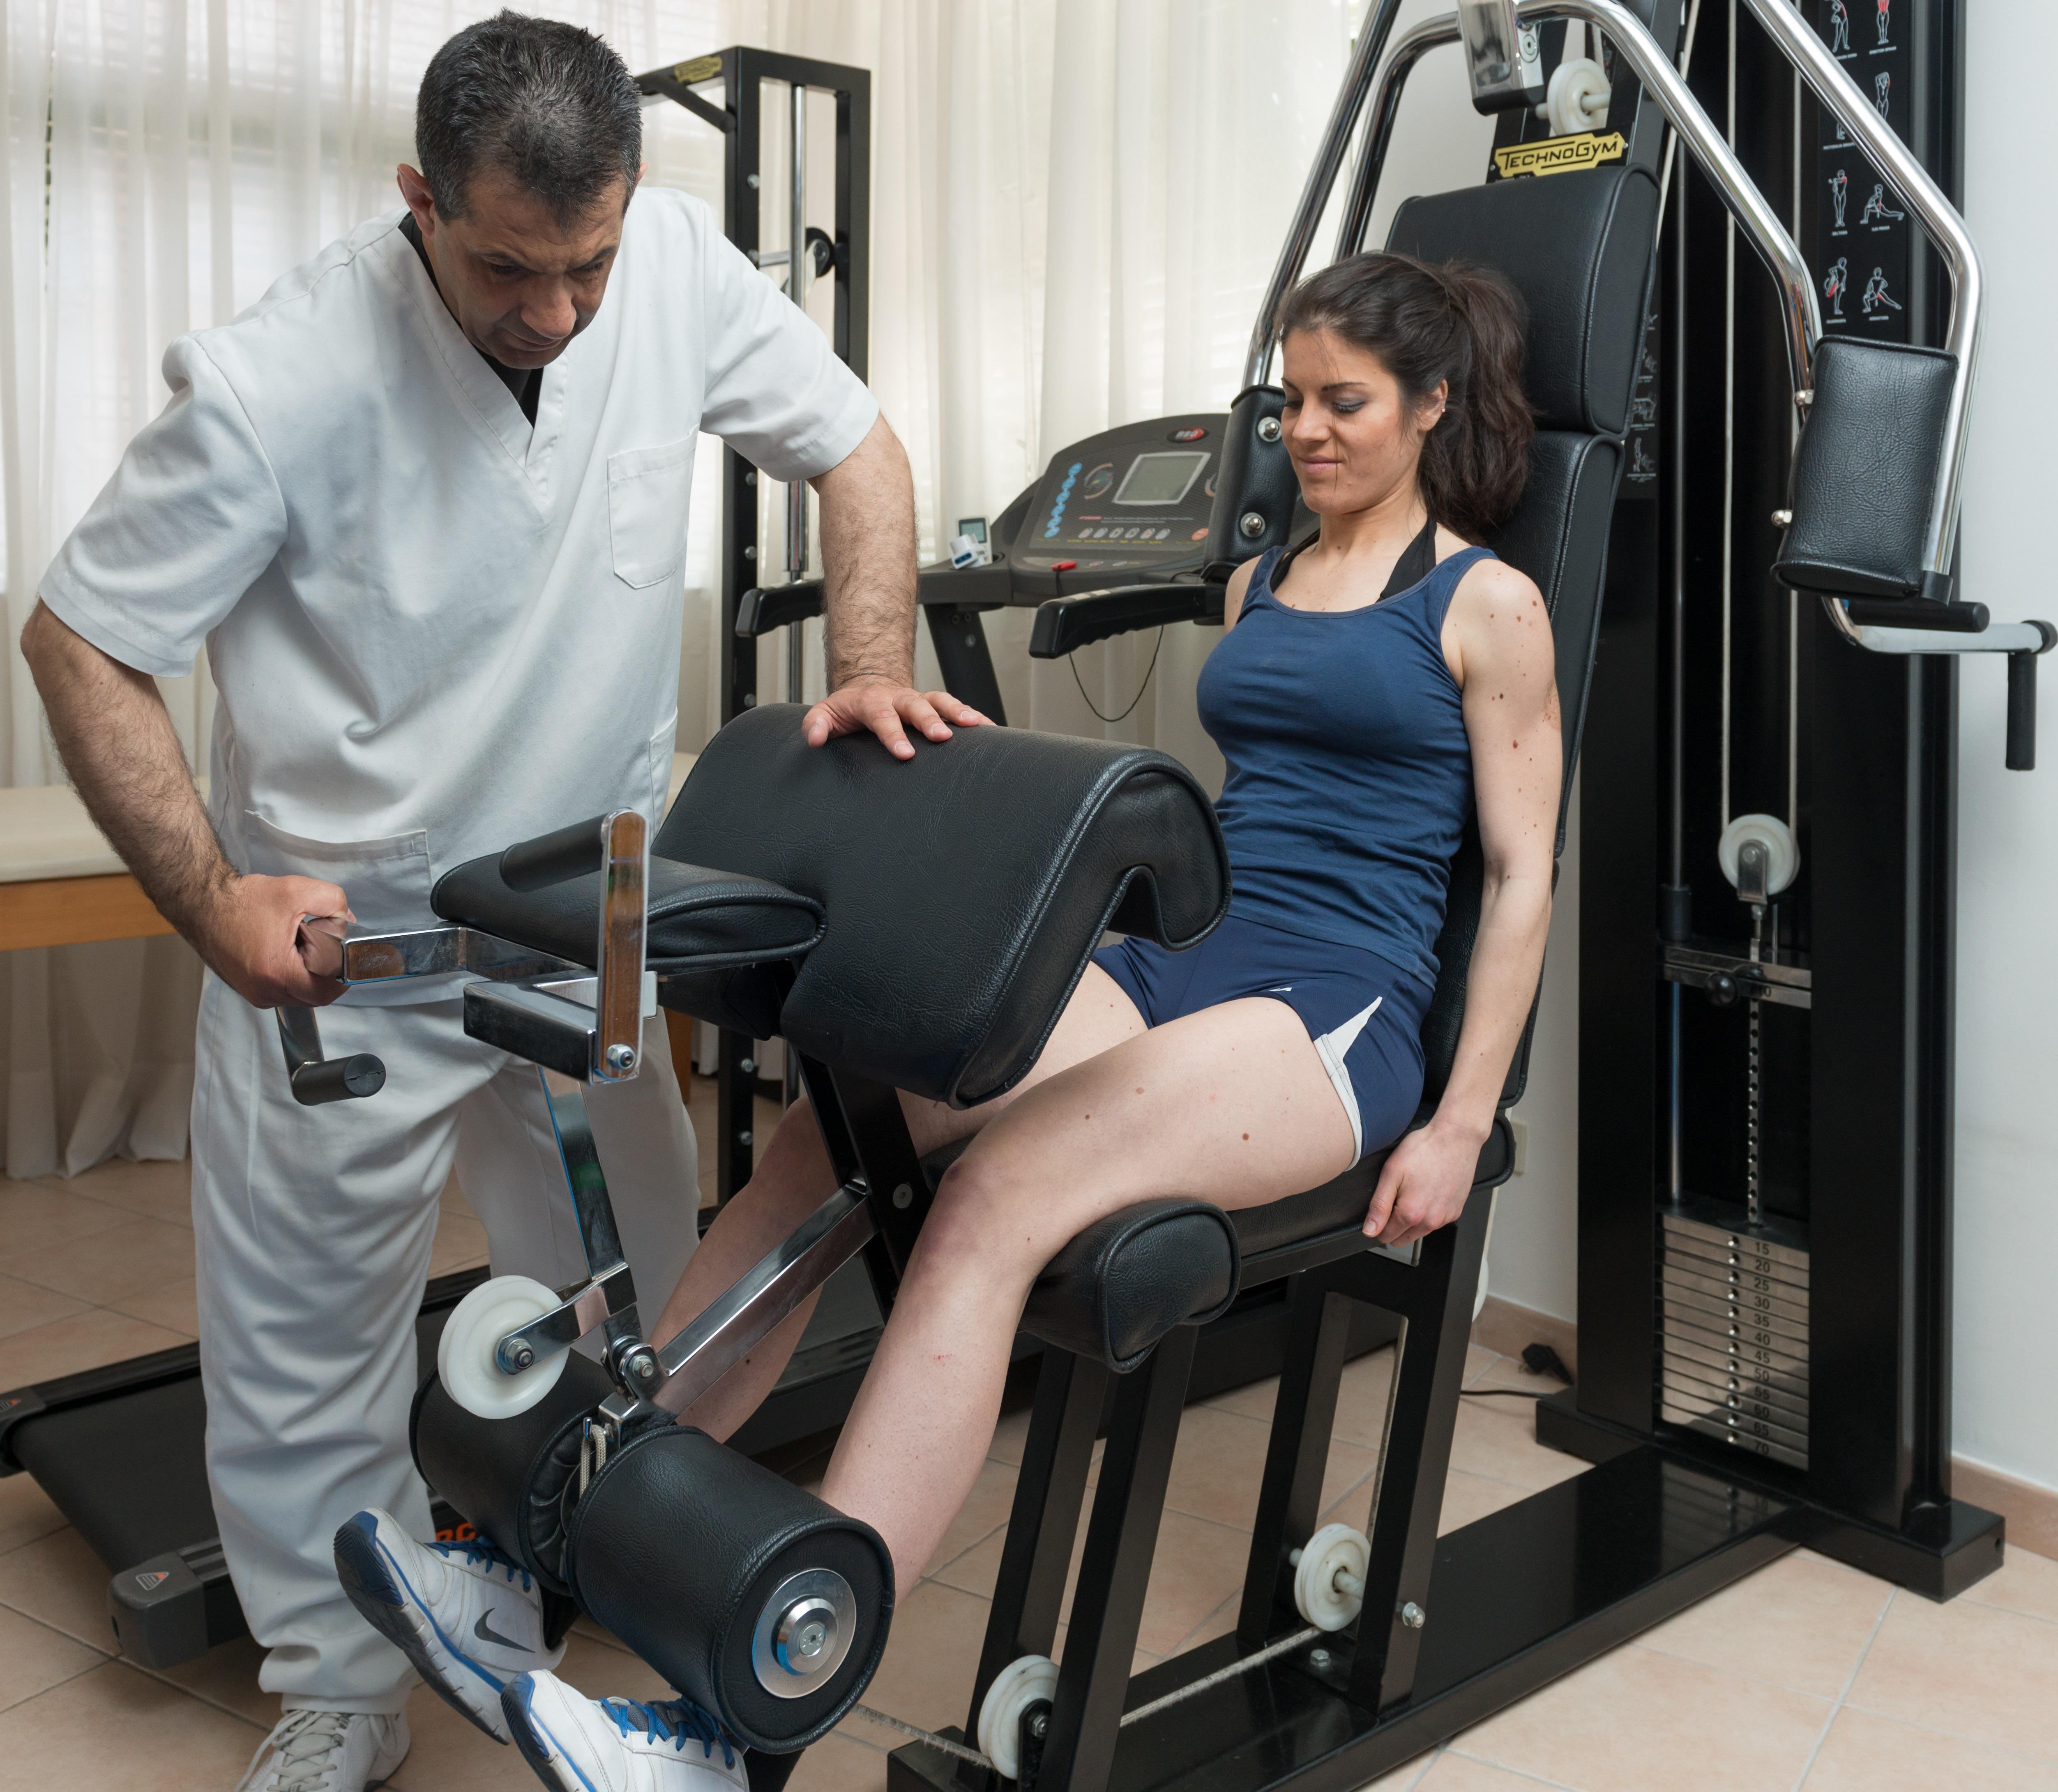 Personal Trainer esclusivo-Personal Trainer a Catania-Studio-Personal Health-fitness-wellness-well being-benessere-efficienza fisica-Prof. Carmelo Giuffrida-Catania-ginnastica cardiologica-dismetabolismi-team-equipe-1